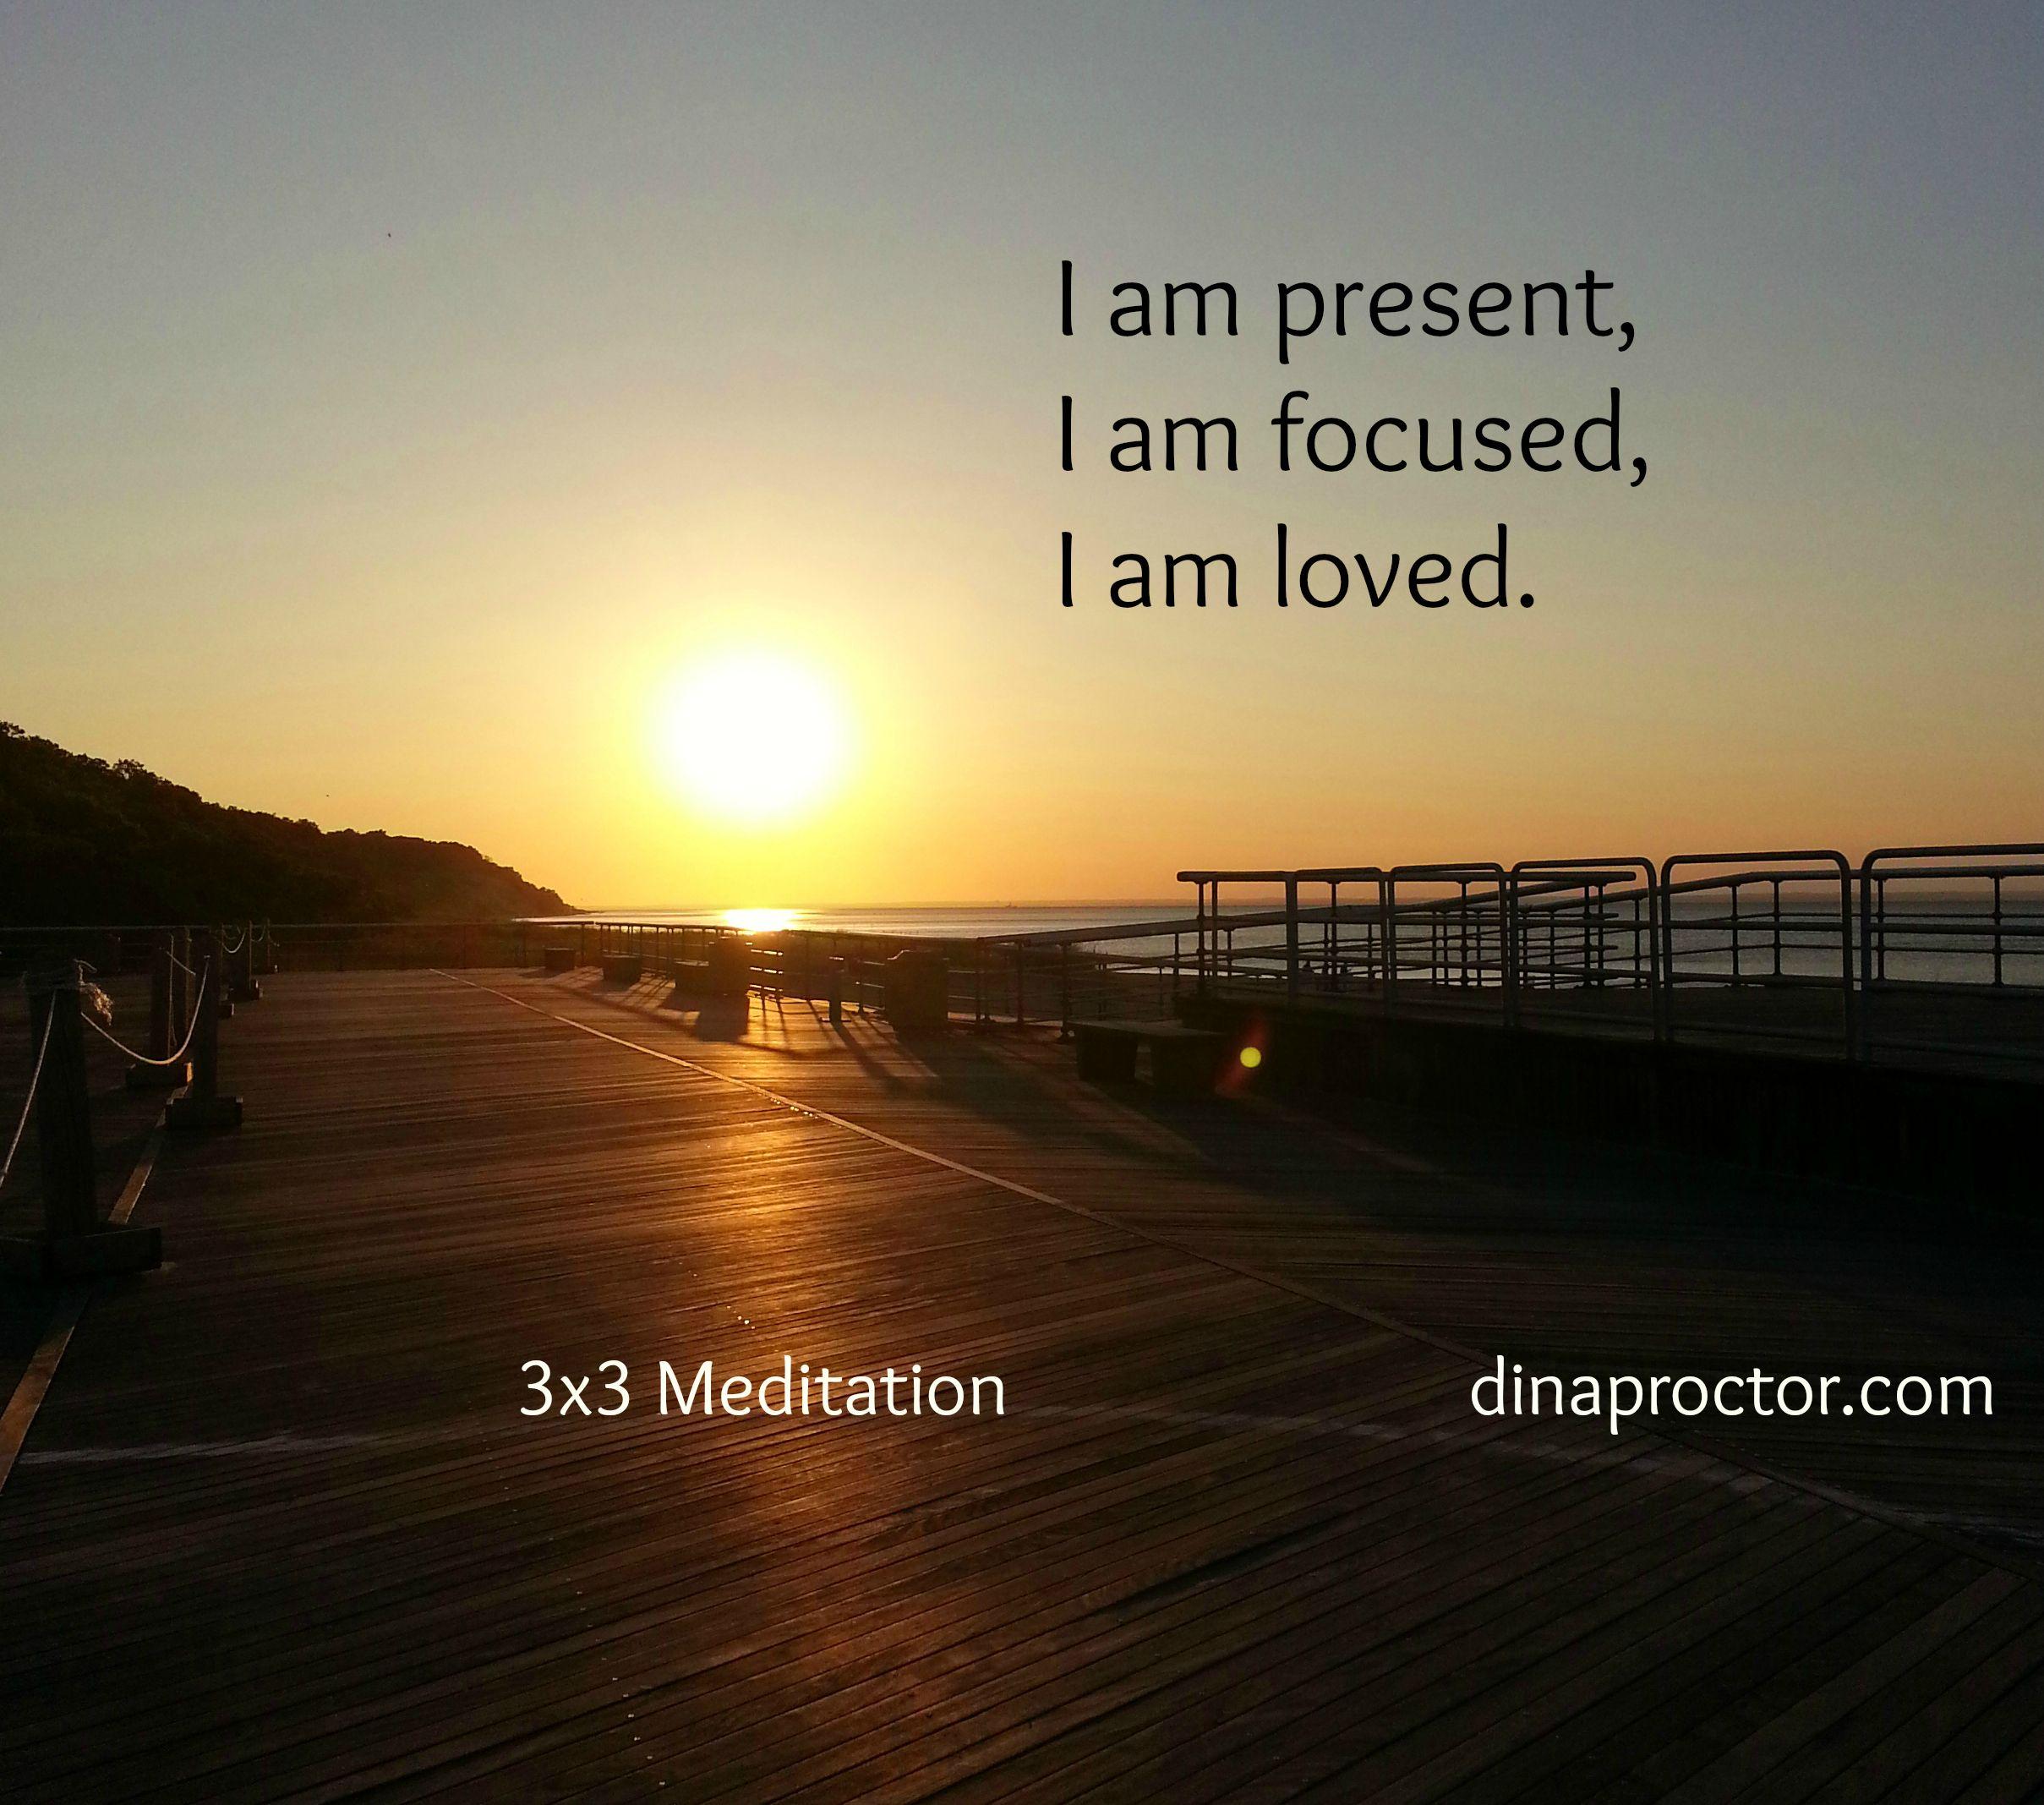 I am present, I am focused, I am loved.